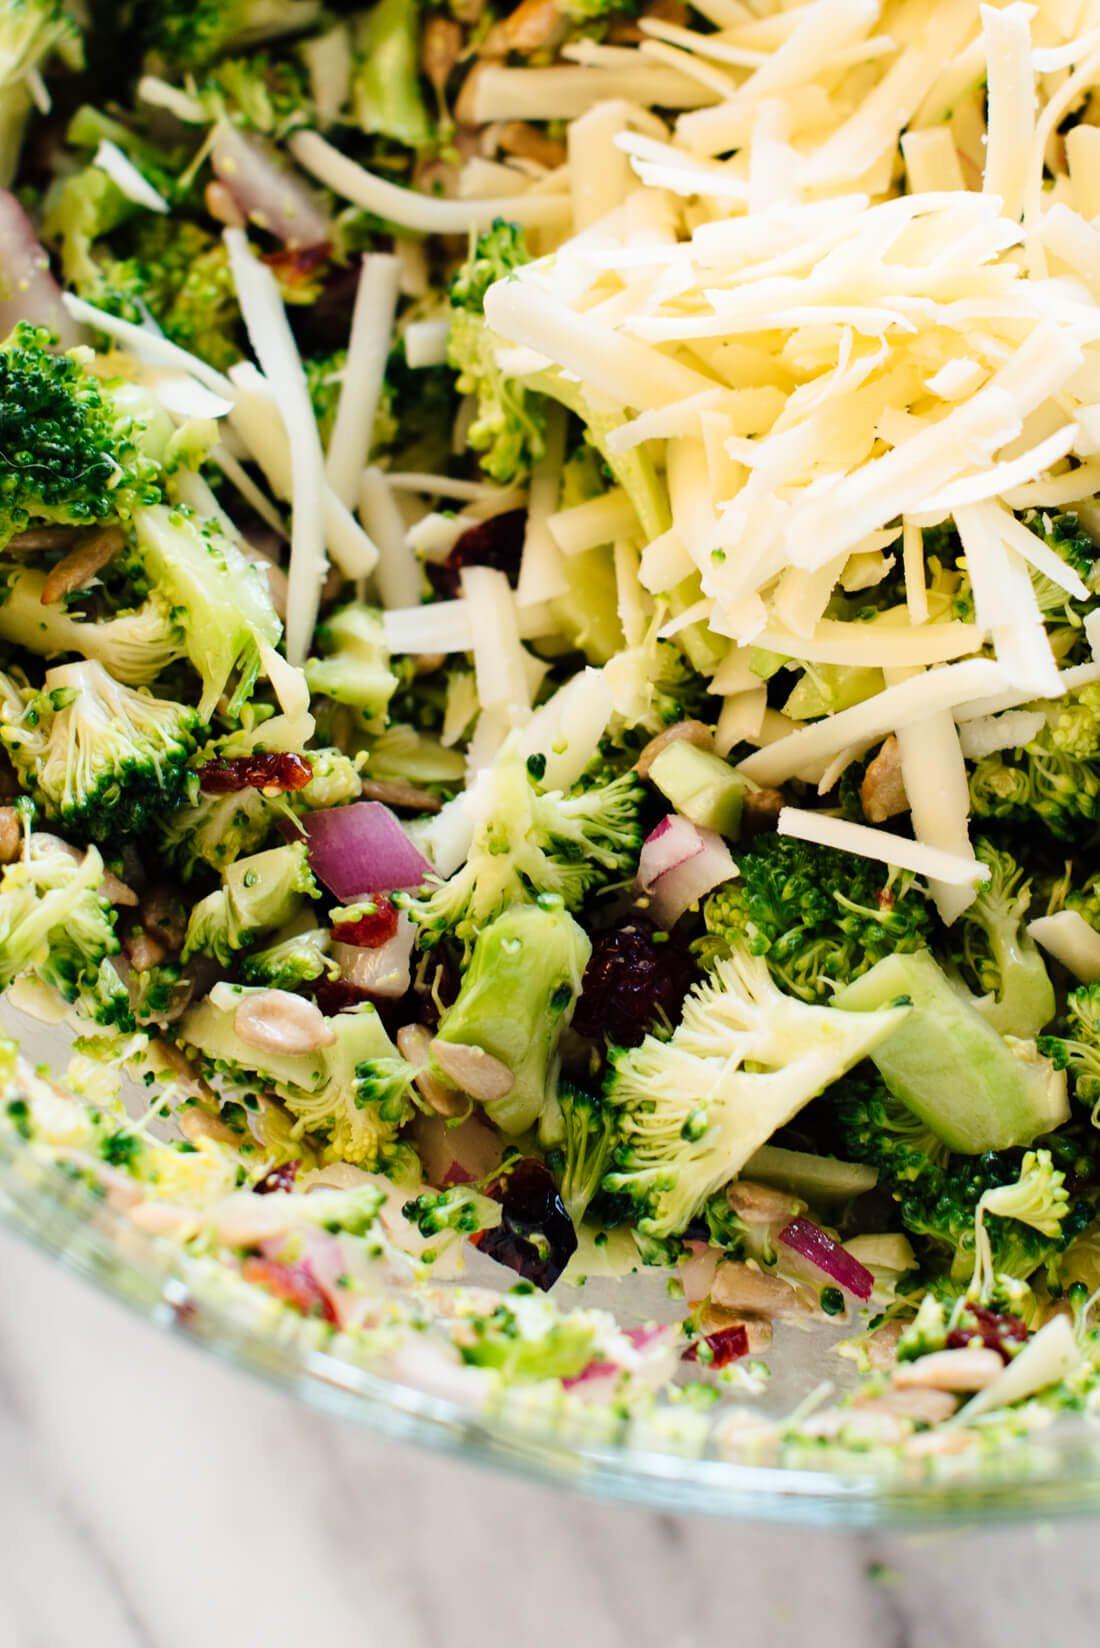 Broccoli Salad No Mayo  Favorite Broccoli Salad Recipe Cookie and Kate